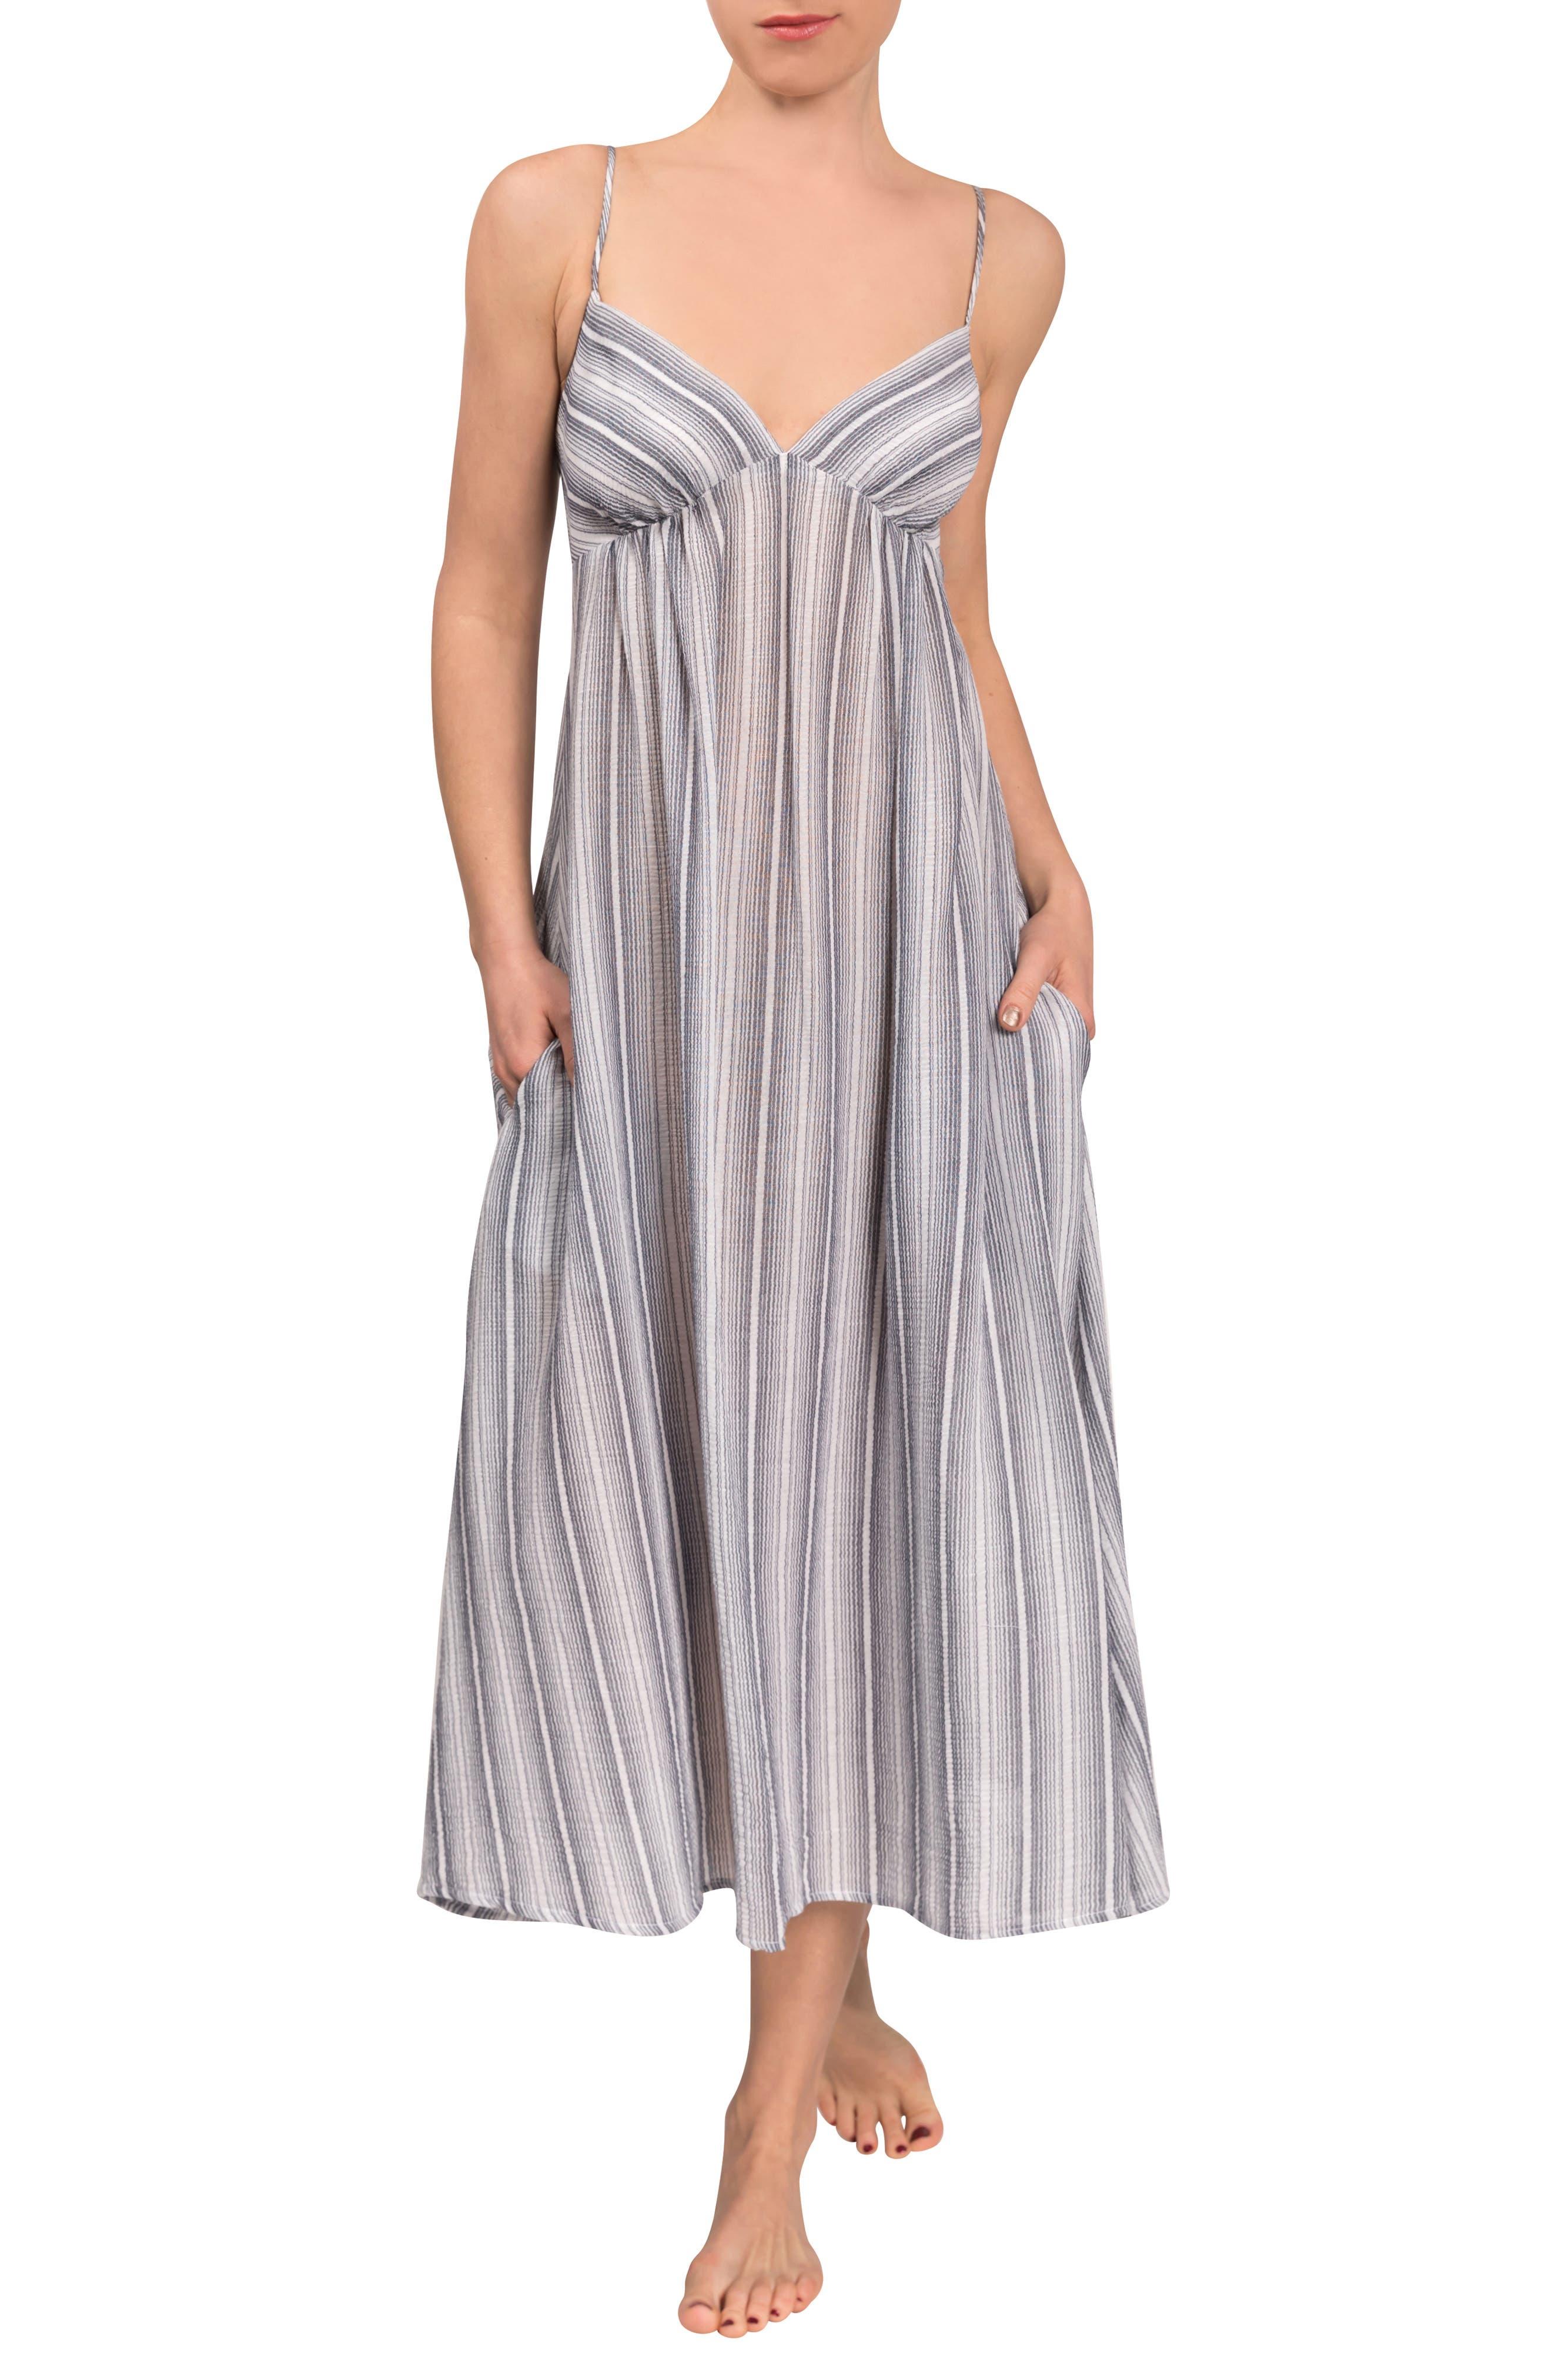 Olivia Nightgown